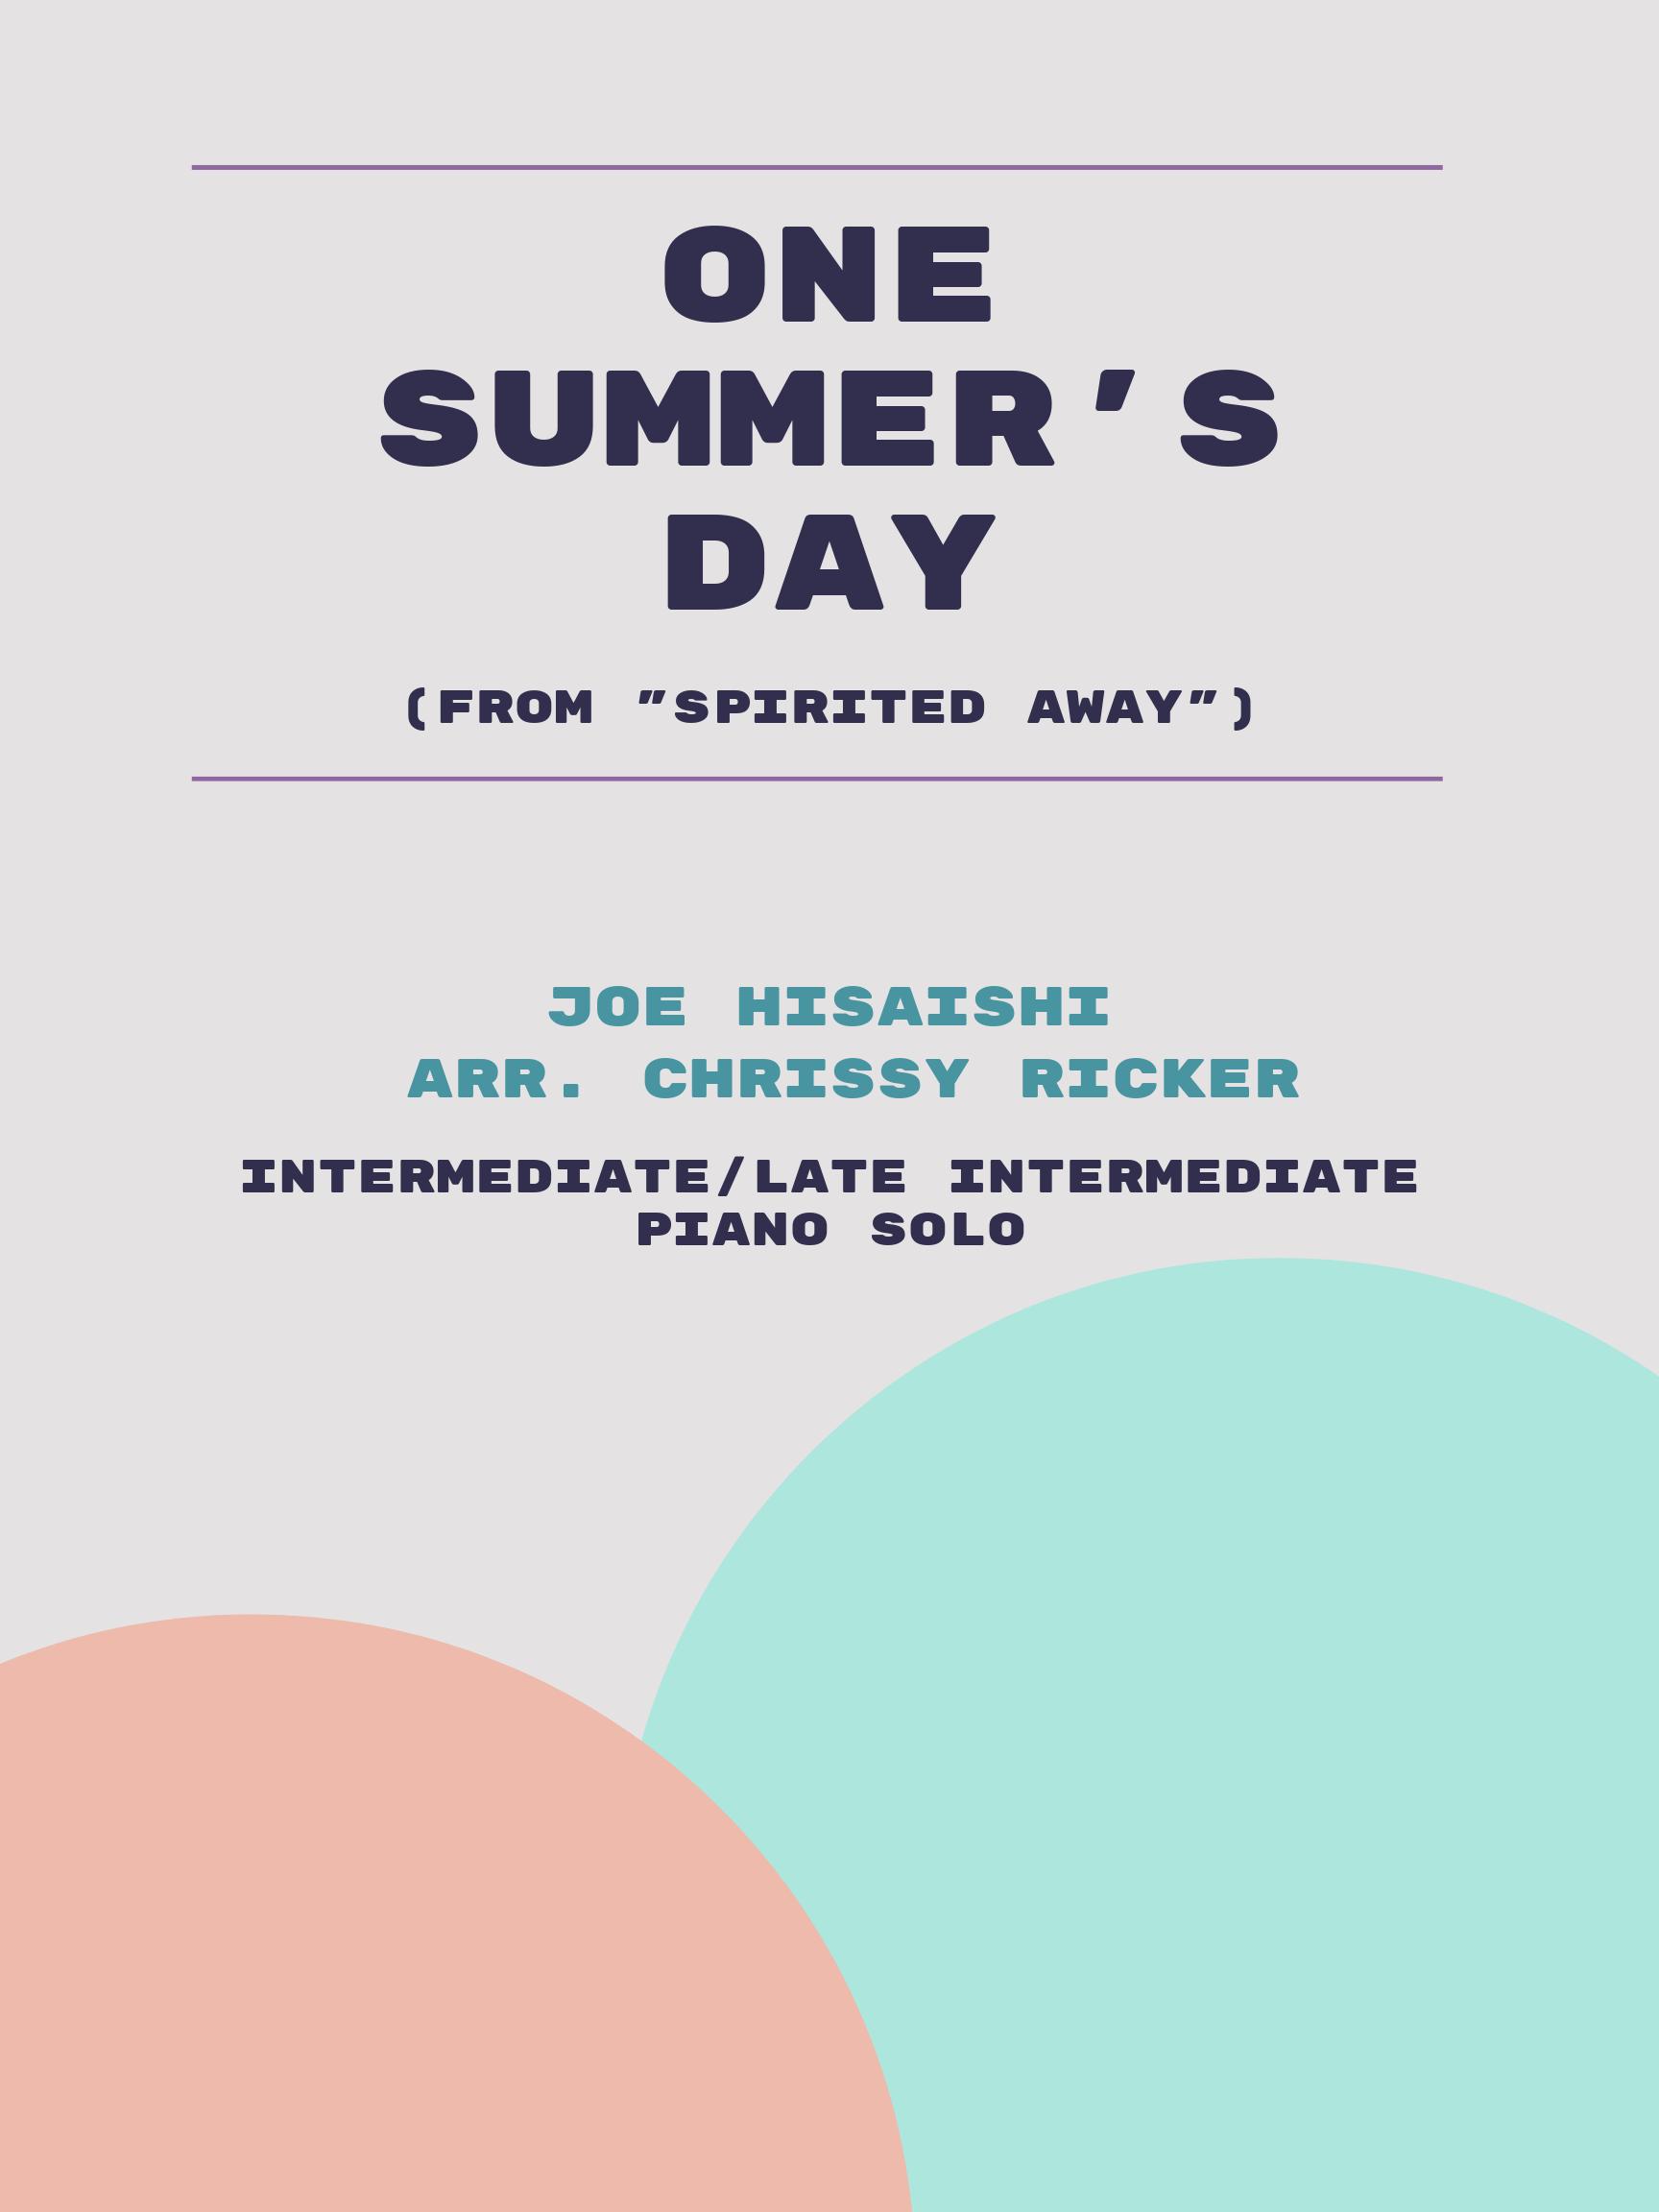 One Summer's Day by Joe Hisaishi